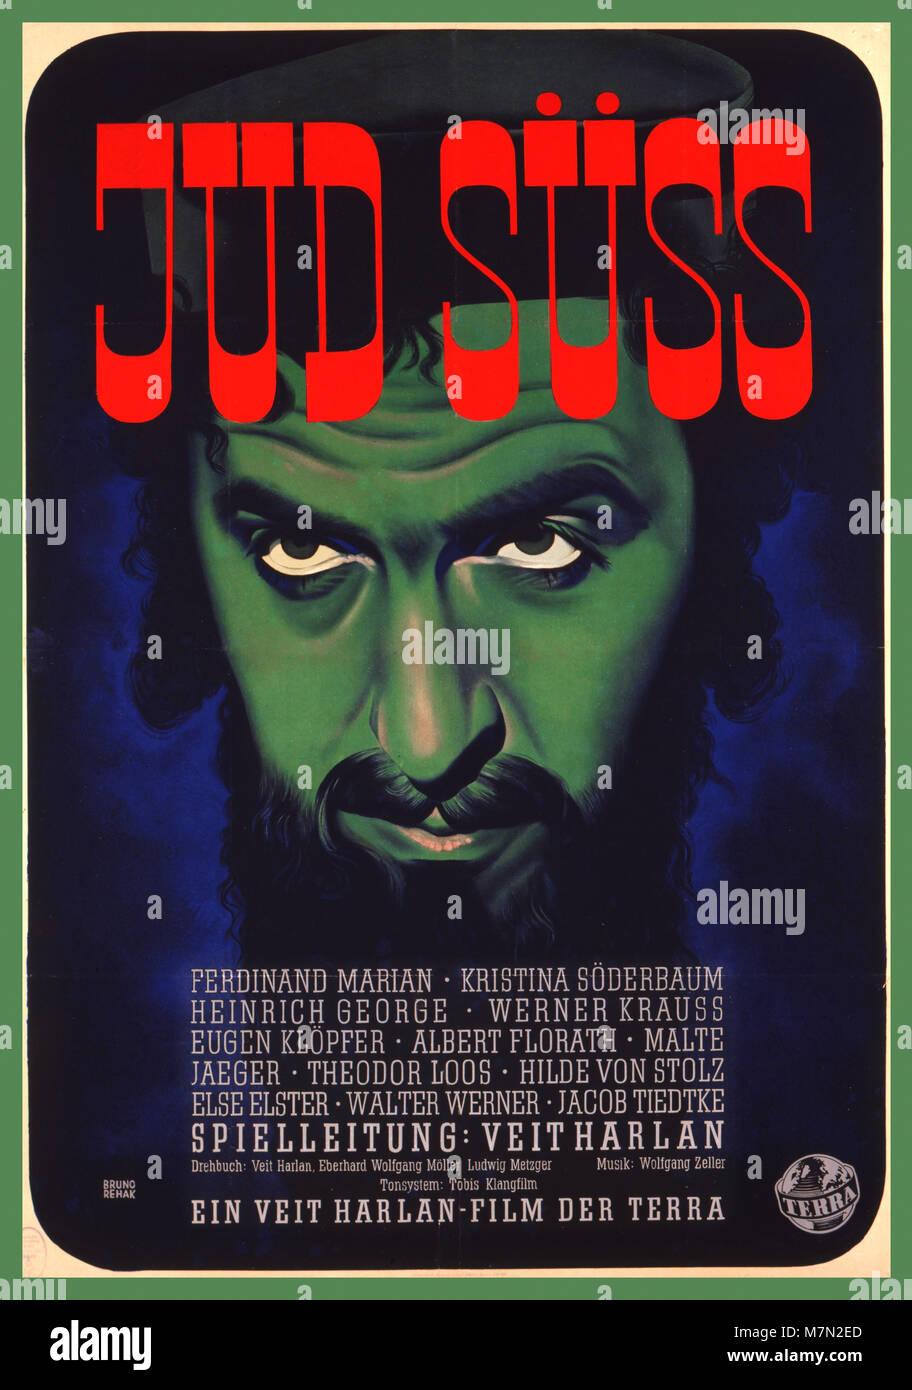 WW2 tedesco Vintage anti-semita film Jud Süss ('Süss l Ebreo') è un 1940 propaganda nazista Immagini Stock